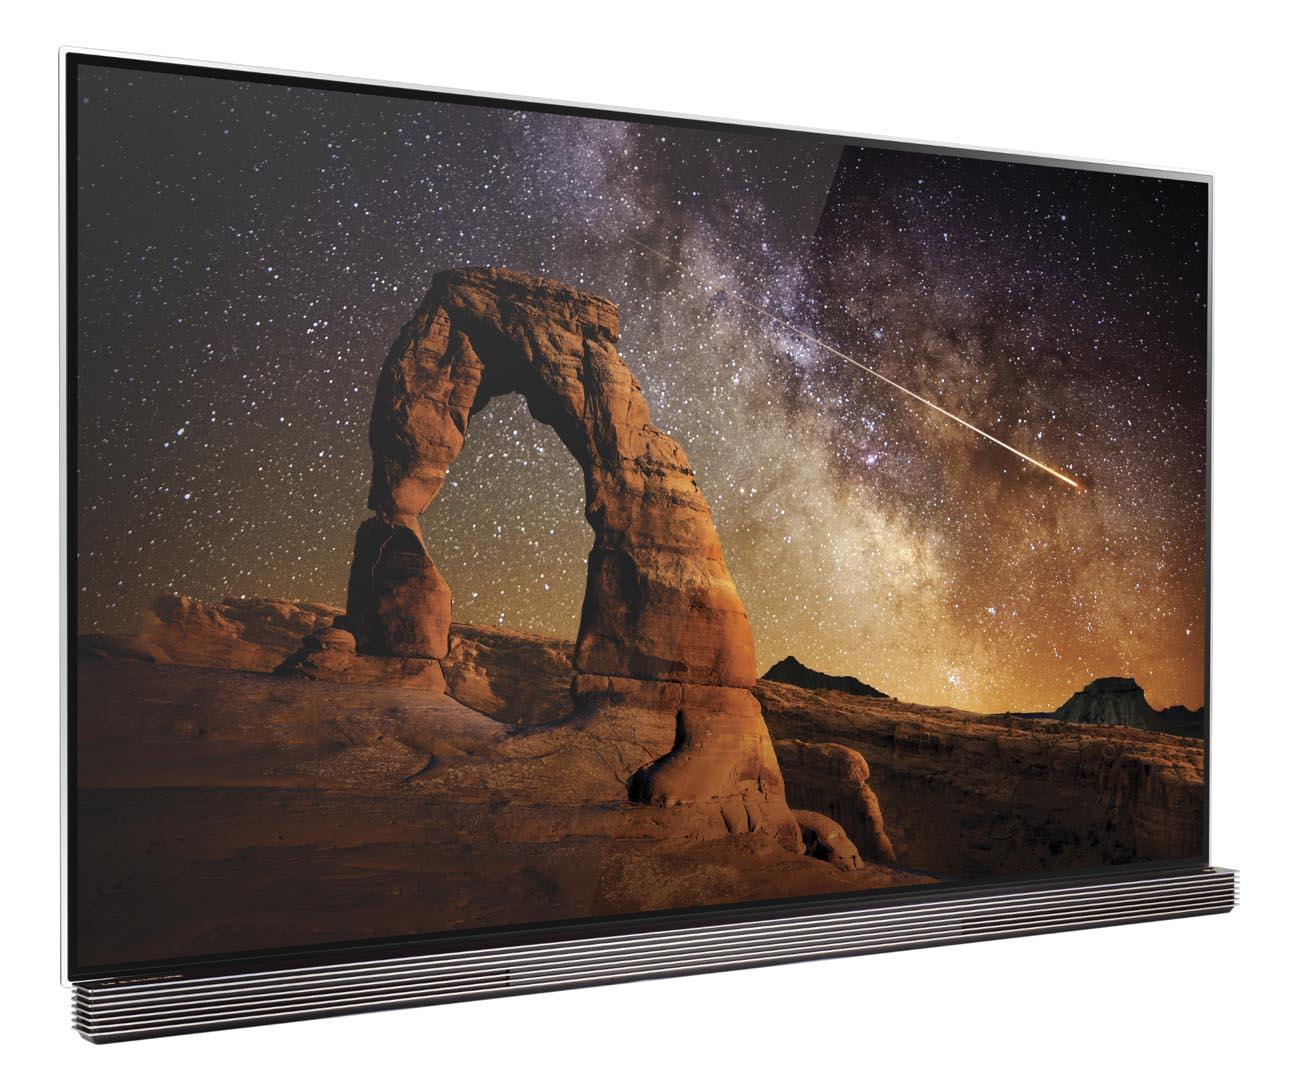 TV LG OLED 65G6